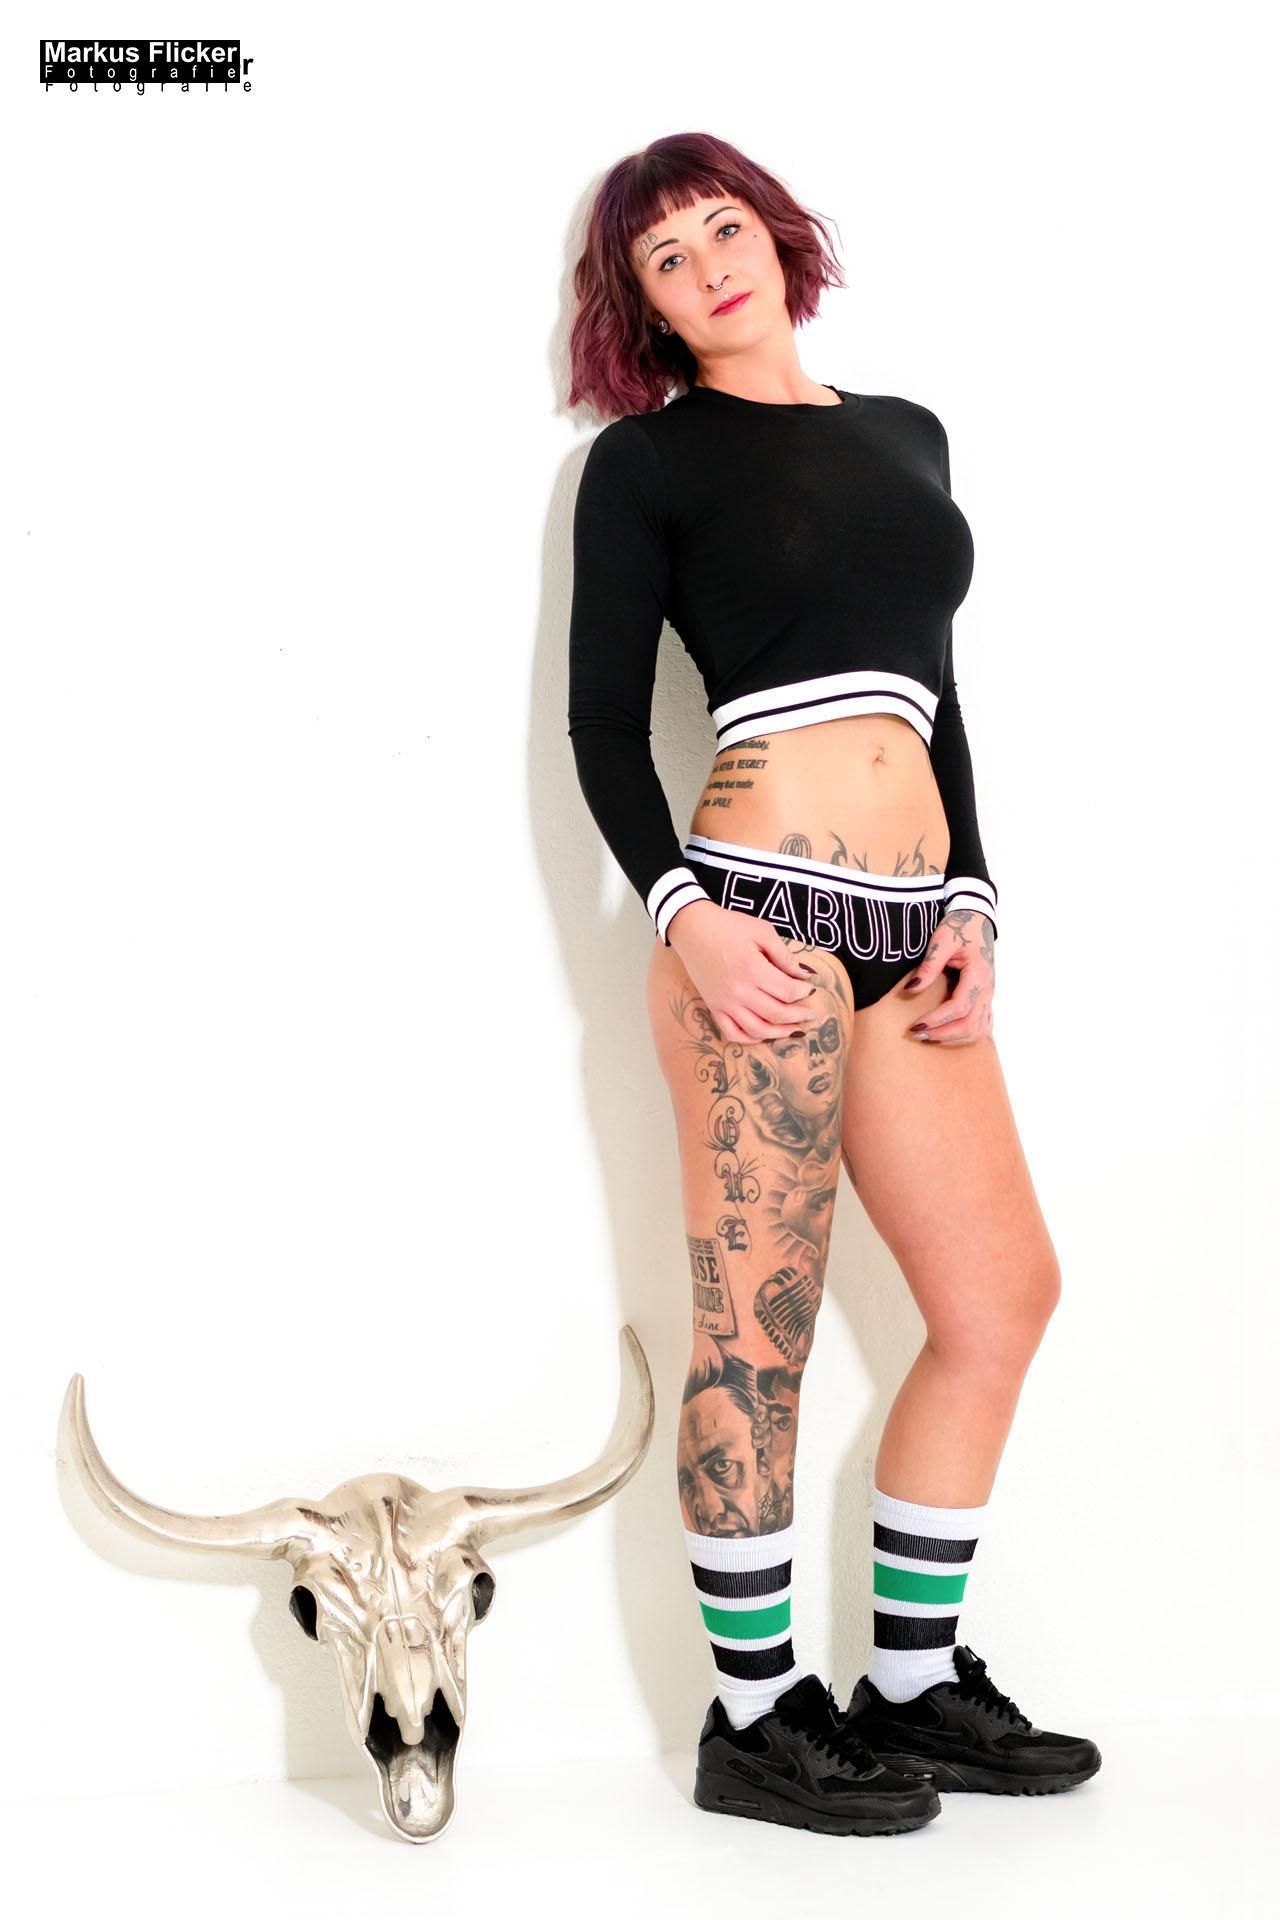 Studio Fotoshooting mit Marietta Wild